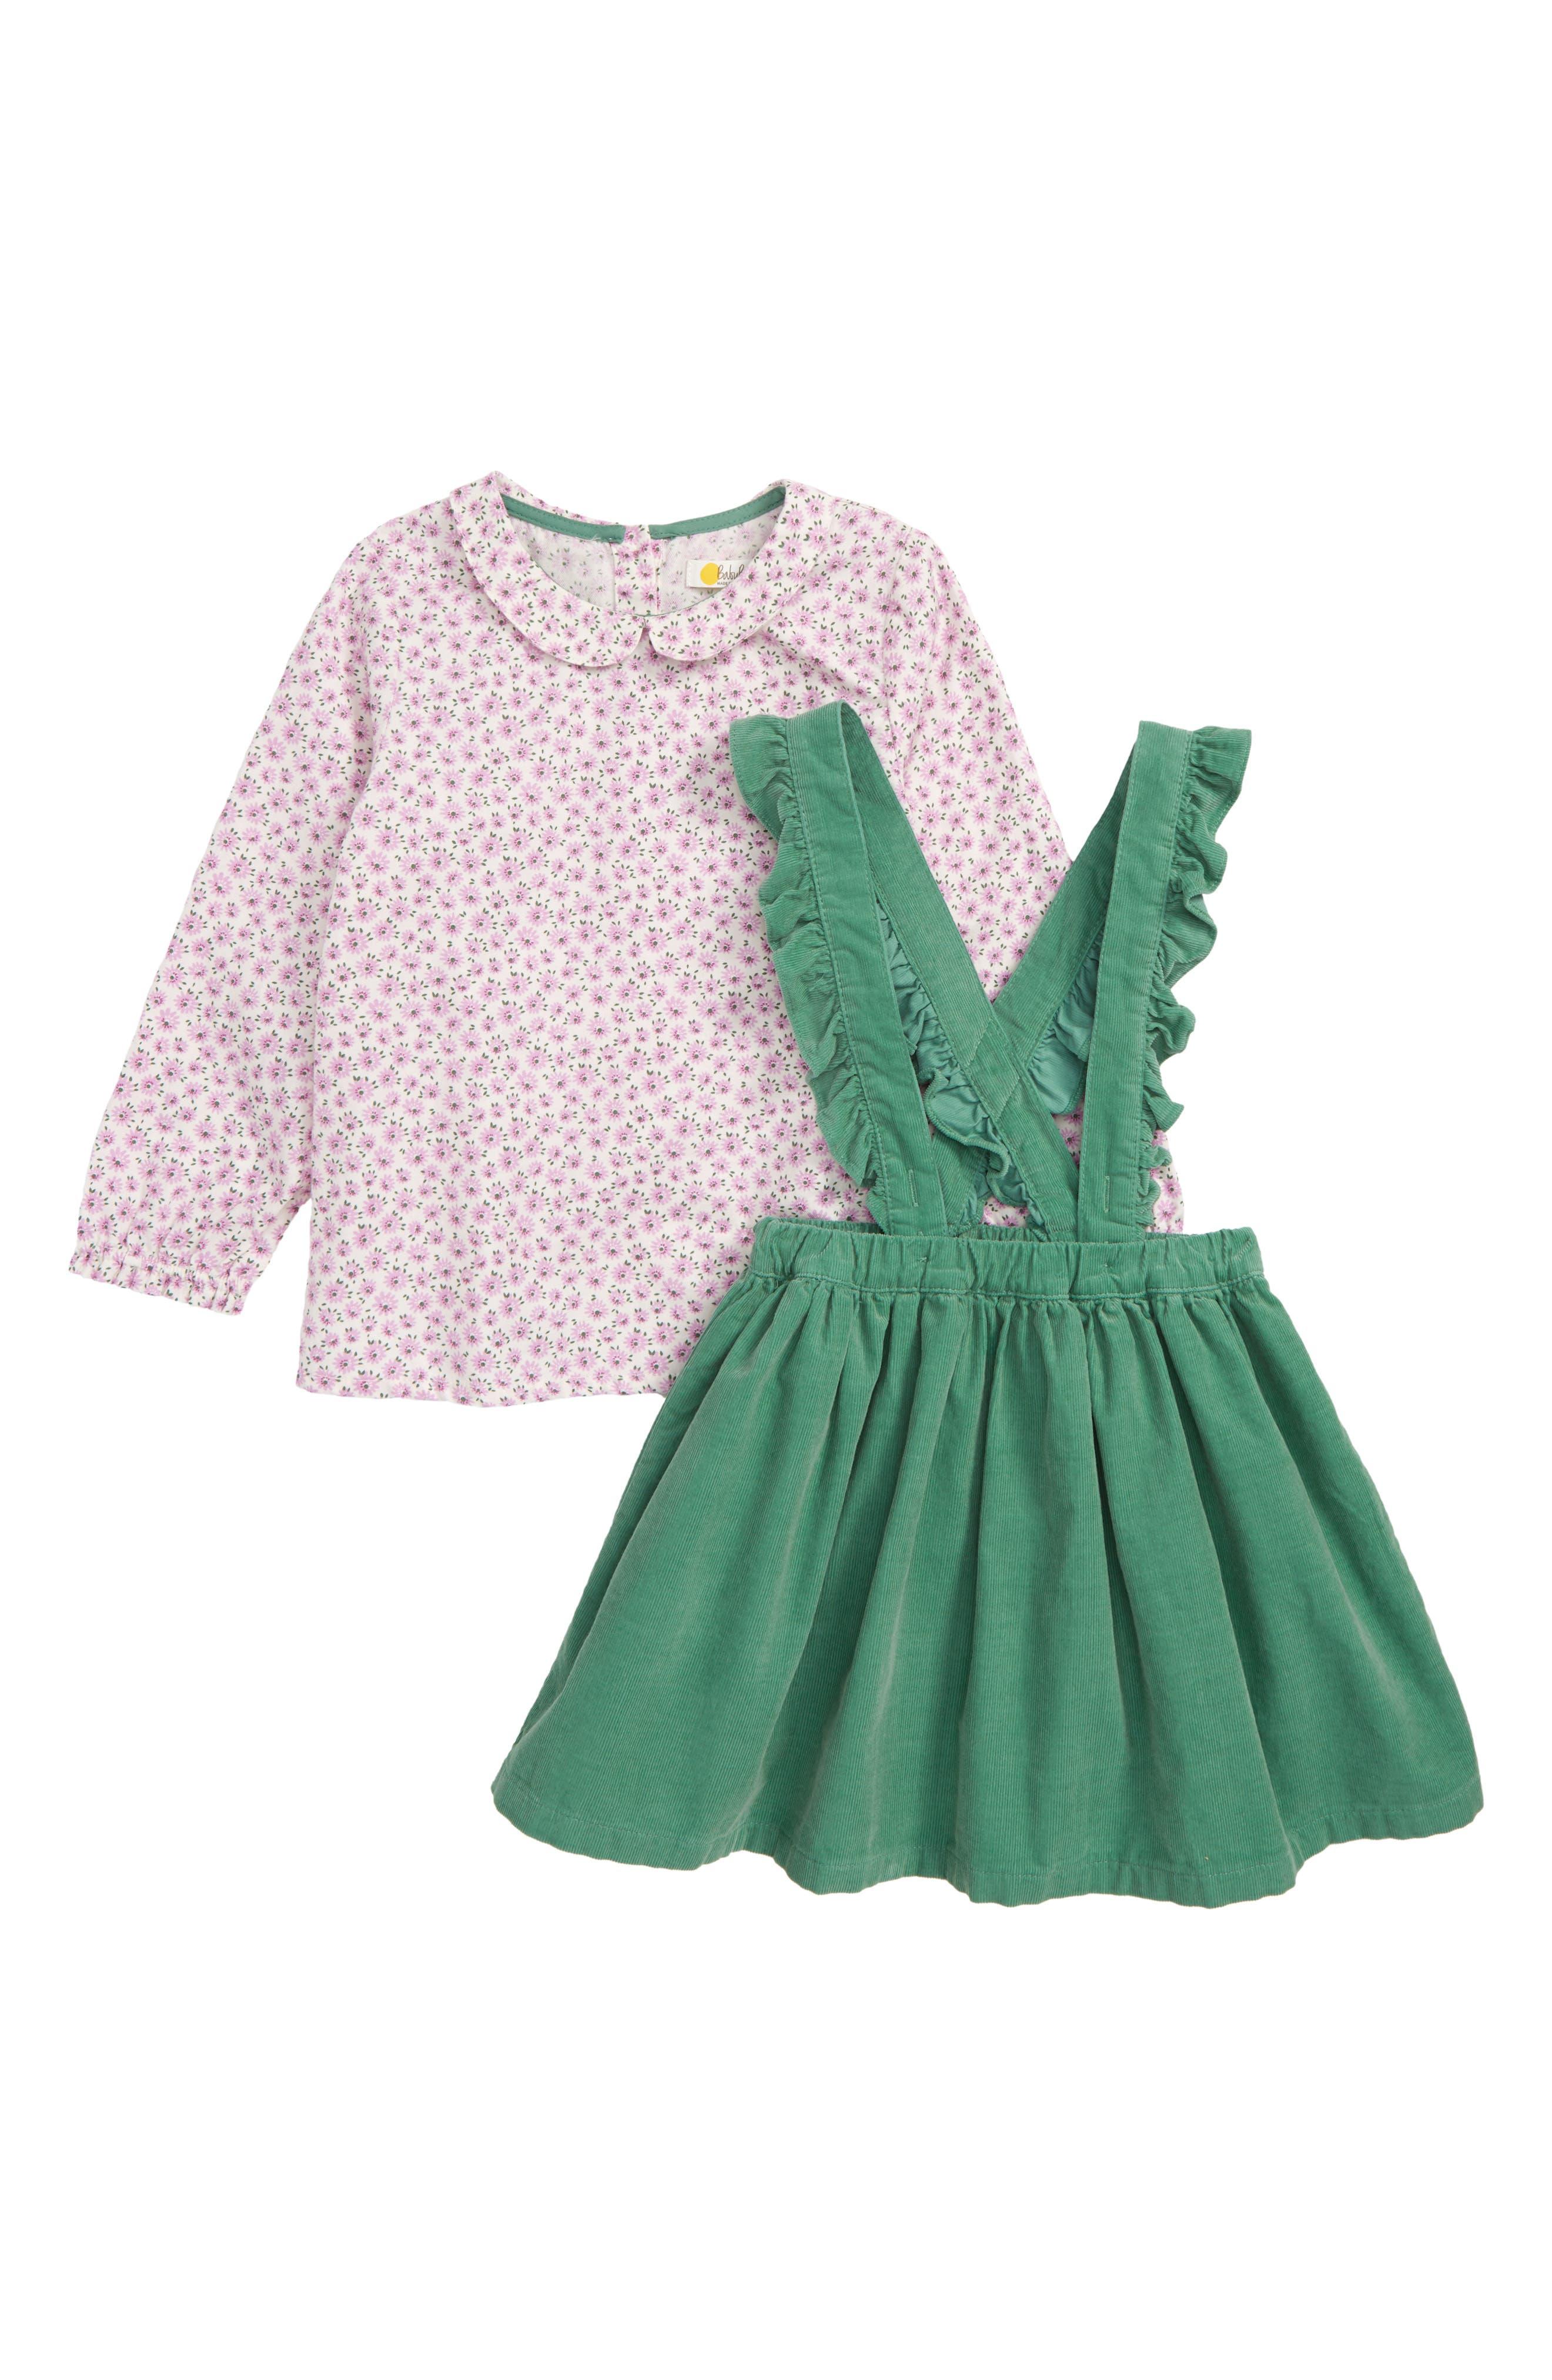 MINI BODEN Nostalgic Print Top & Overall Skirt, Main, color, 514